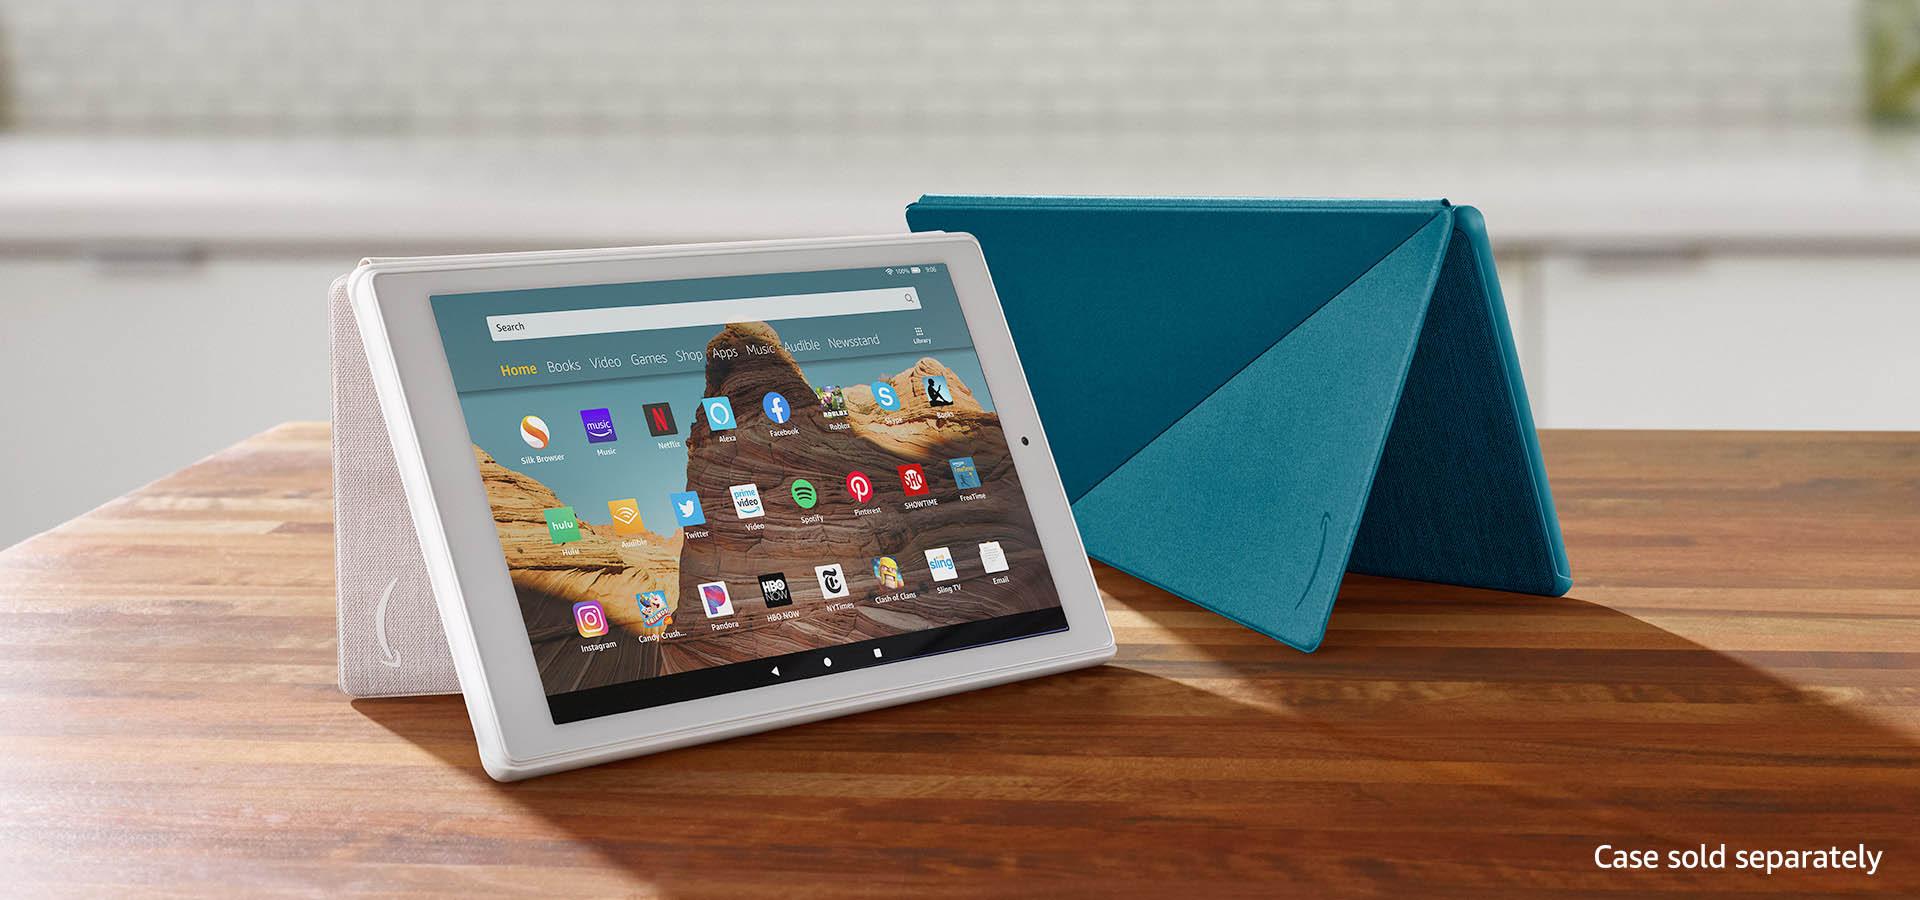 Amazon Com Fire Hd 10 Tablet 10 1 1080p Full Hd Display 32 Gb Black Kindle Store